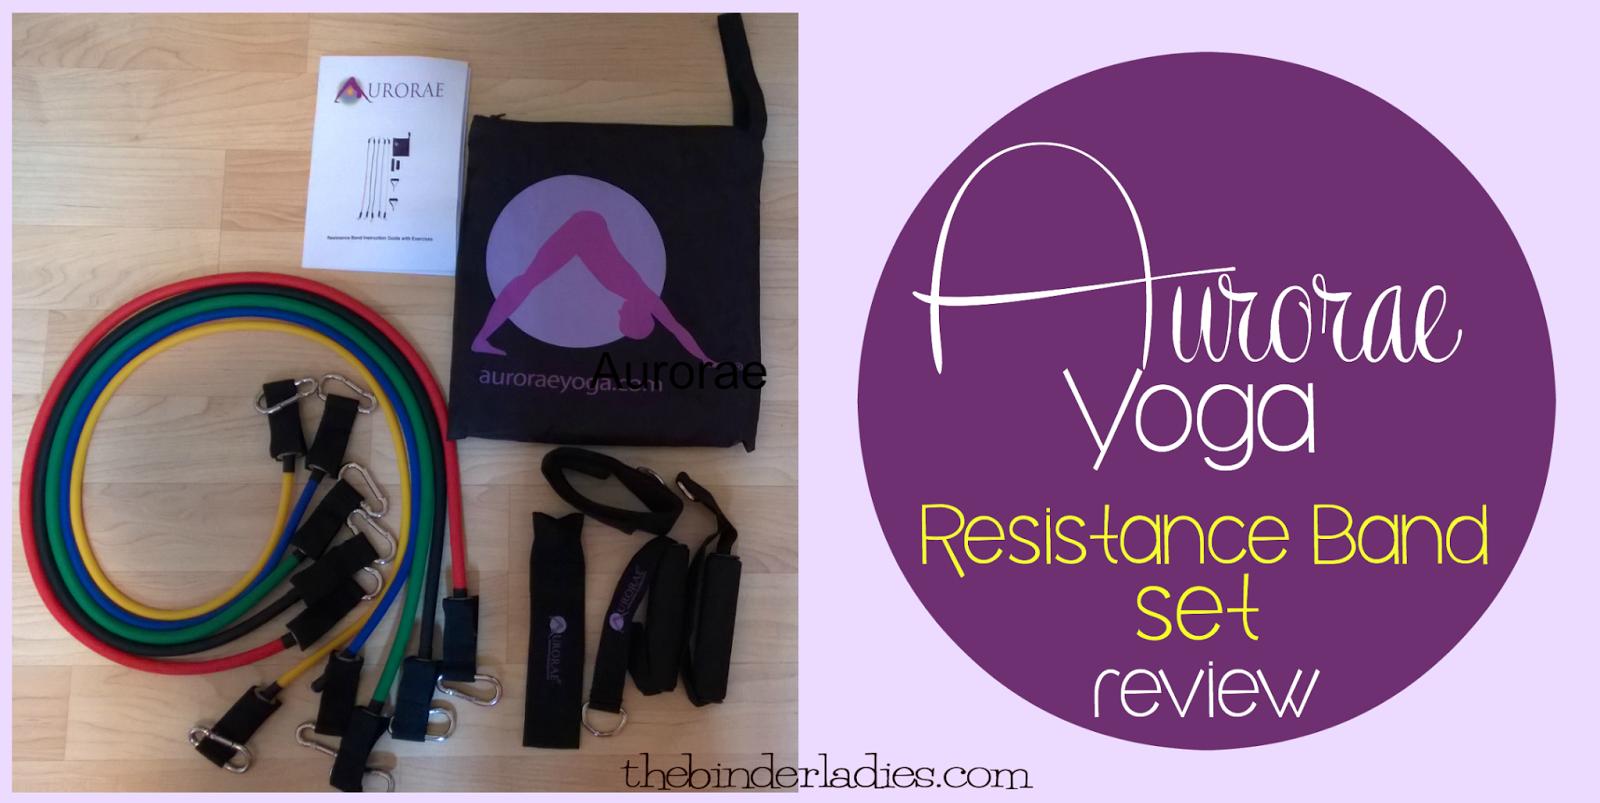 http://www.thebinderladies.com/2015/03/aurora-yoga-resistance-bands-set-review.html#.VPOndULduyM